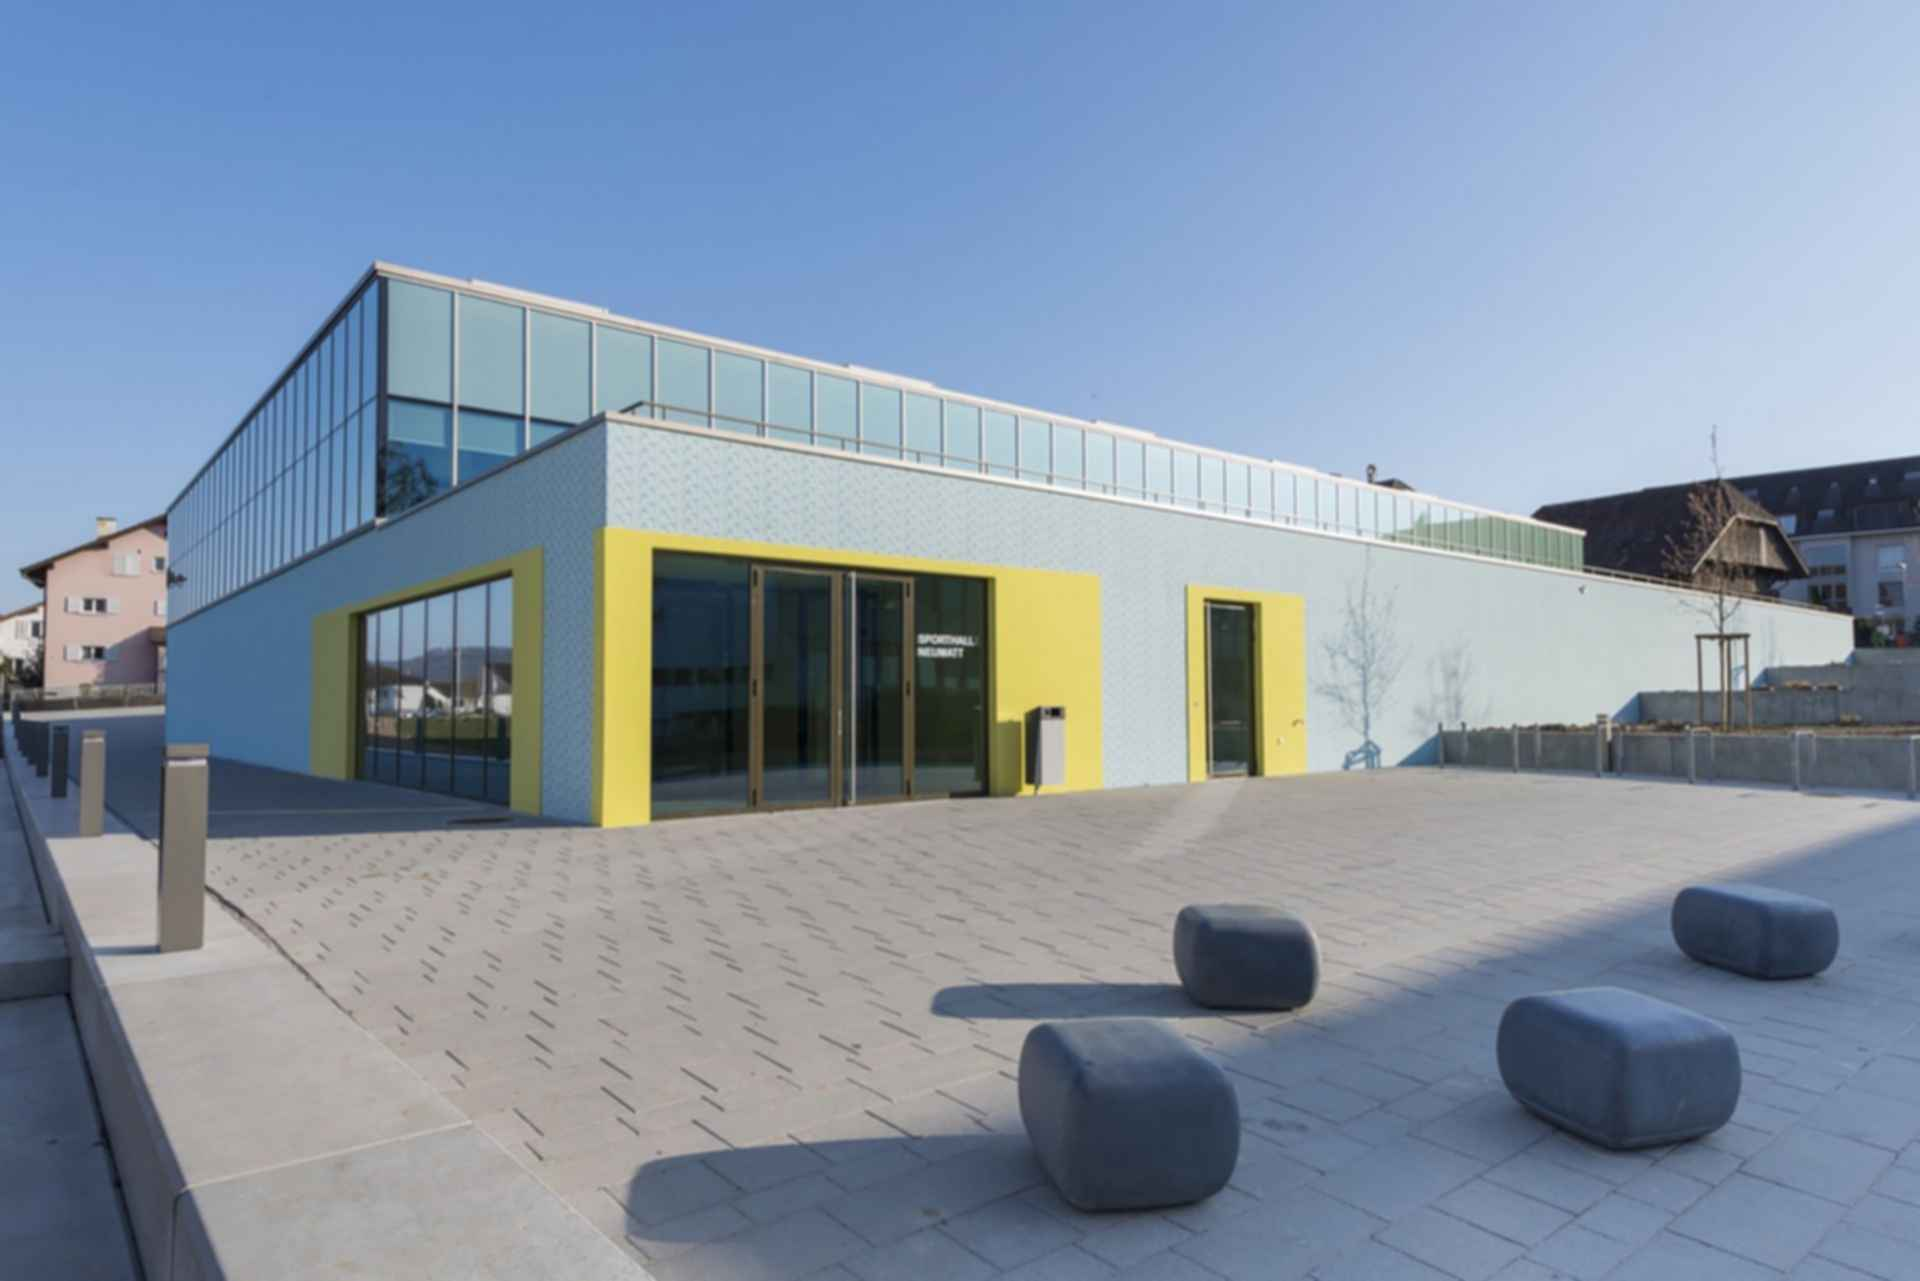 Neumatt Sports Facility - Exterior/Entrance